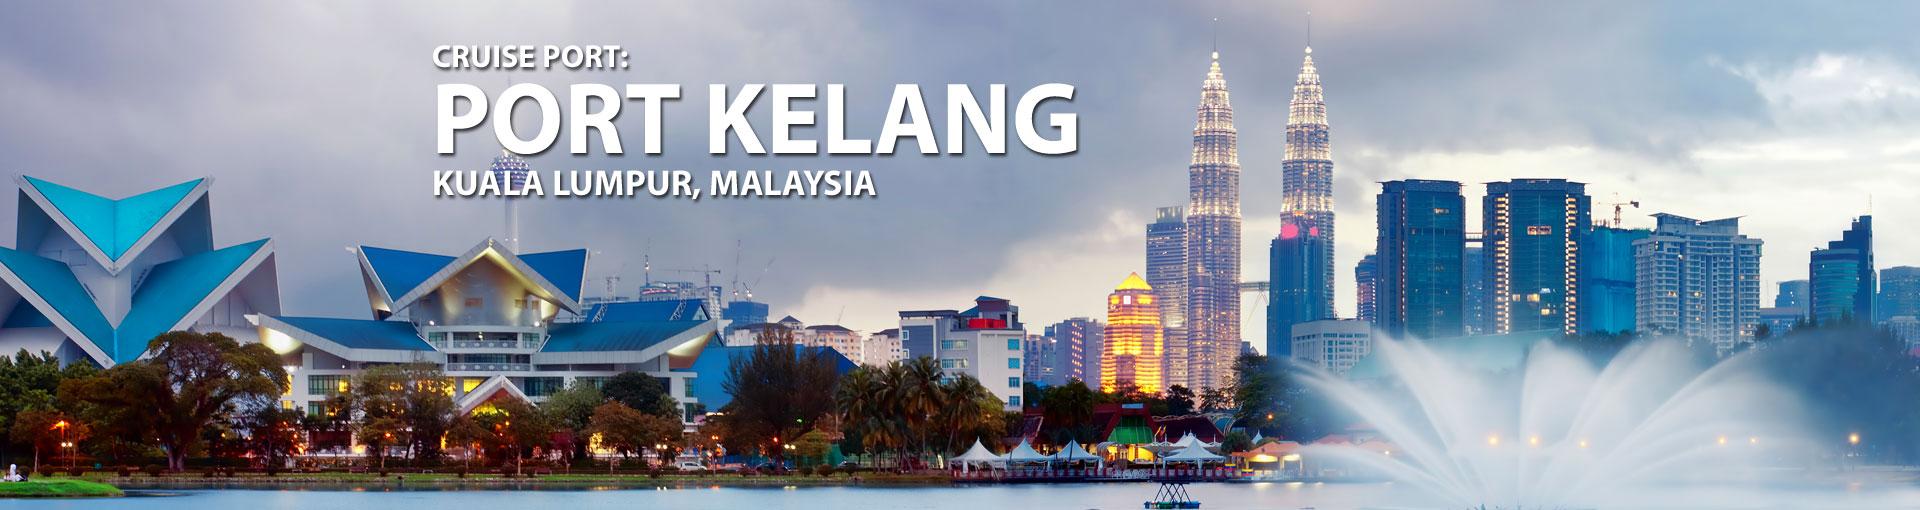 Cruises to Port Kelang (Kuala Lumpur), Malaysia